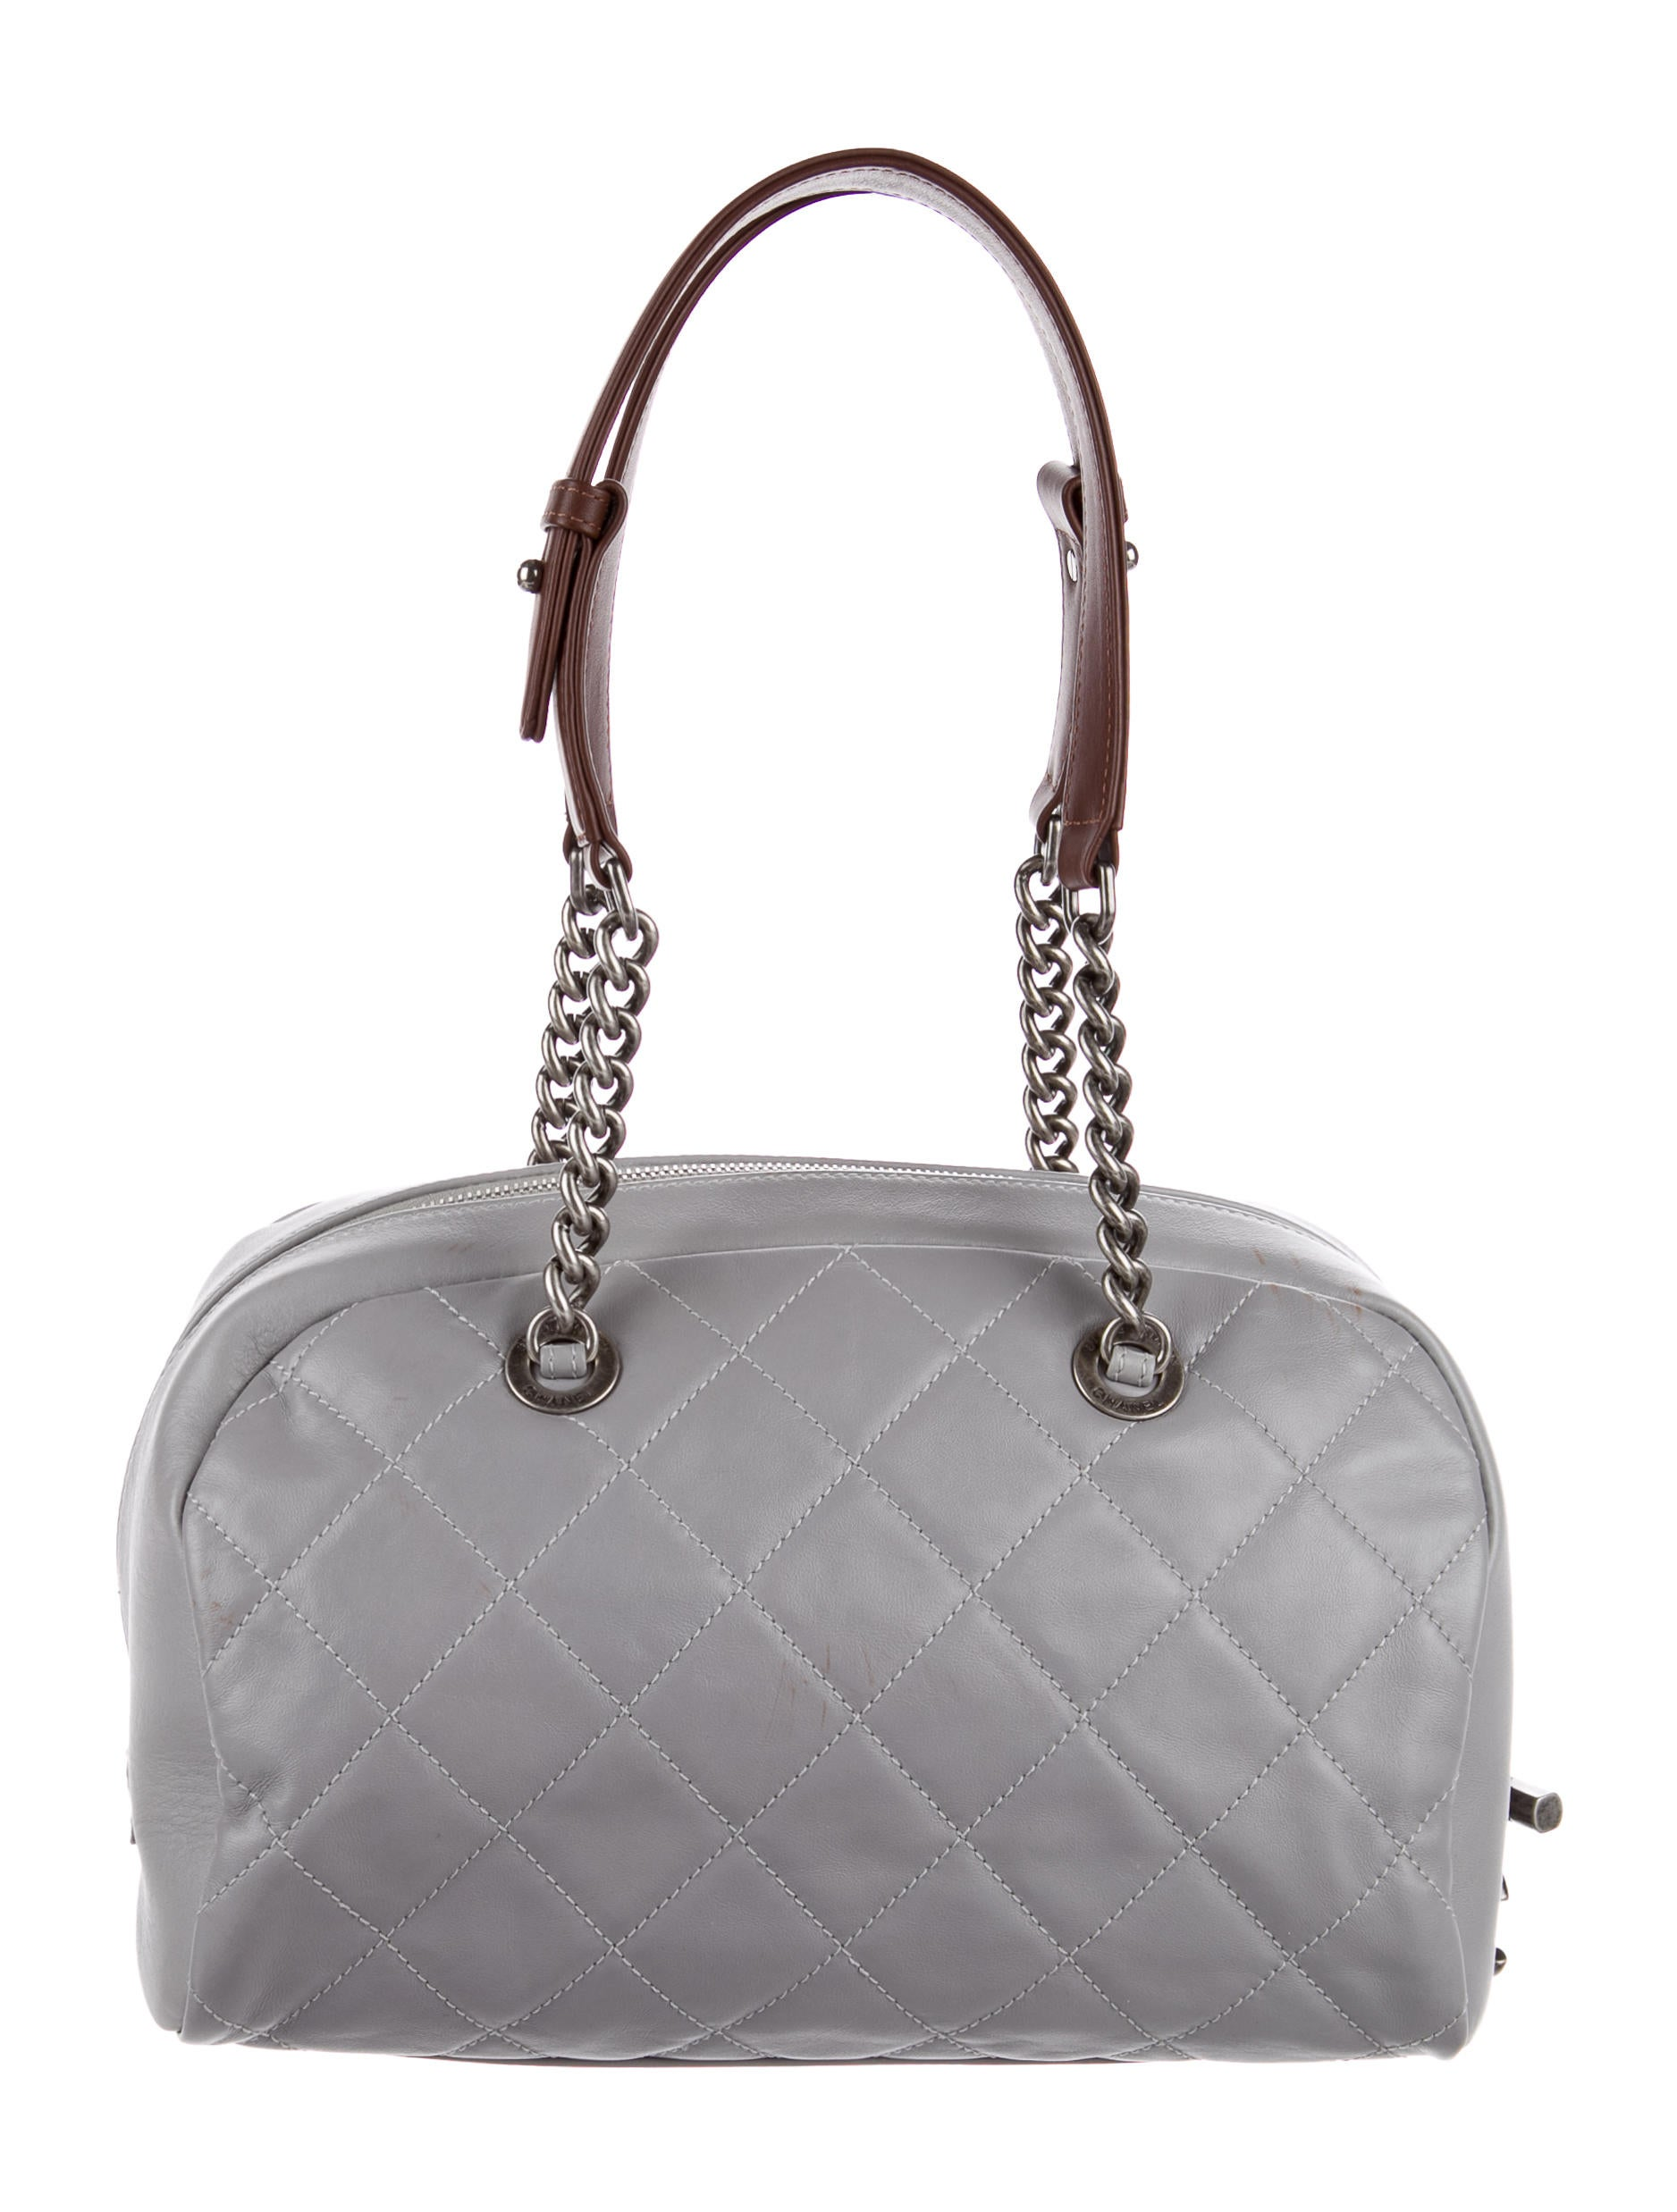 2a21247249dc Burberry Haymarket Medium Golderton Tote - Handbags - BUR50858